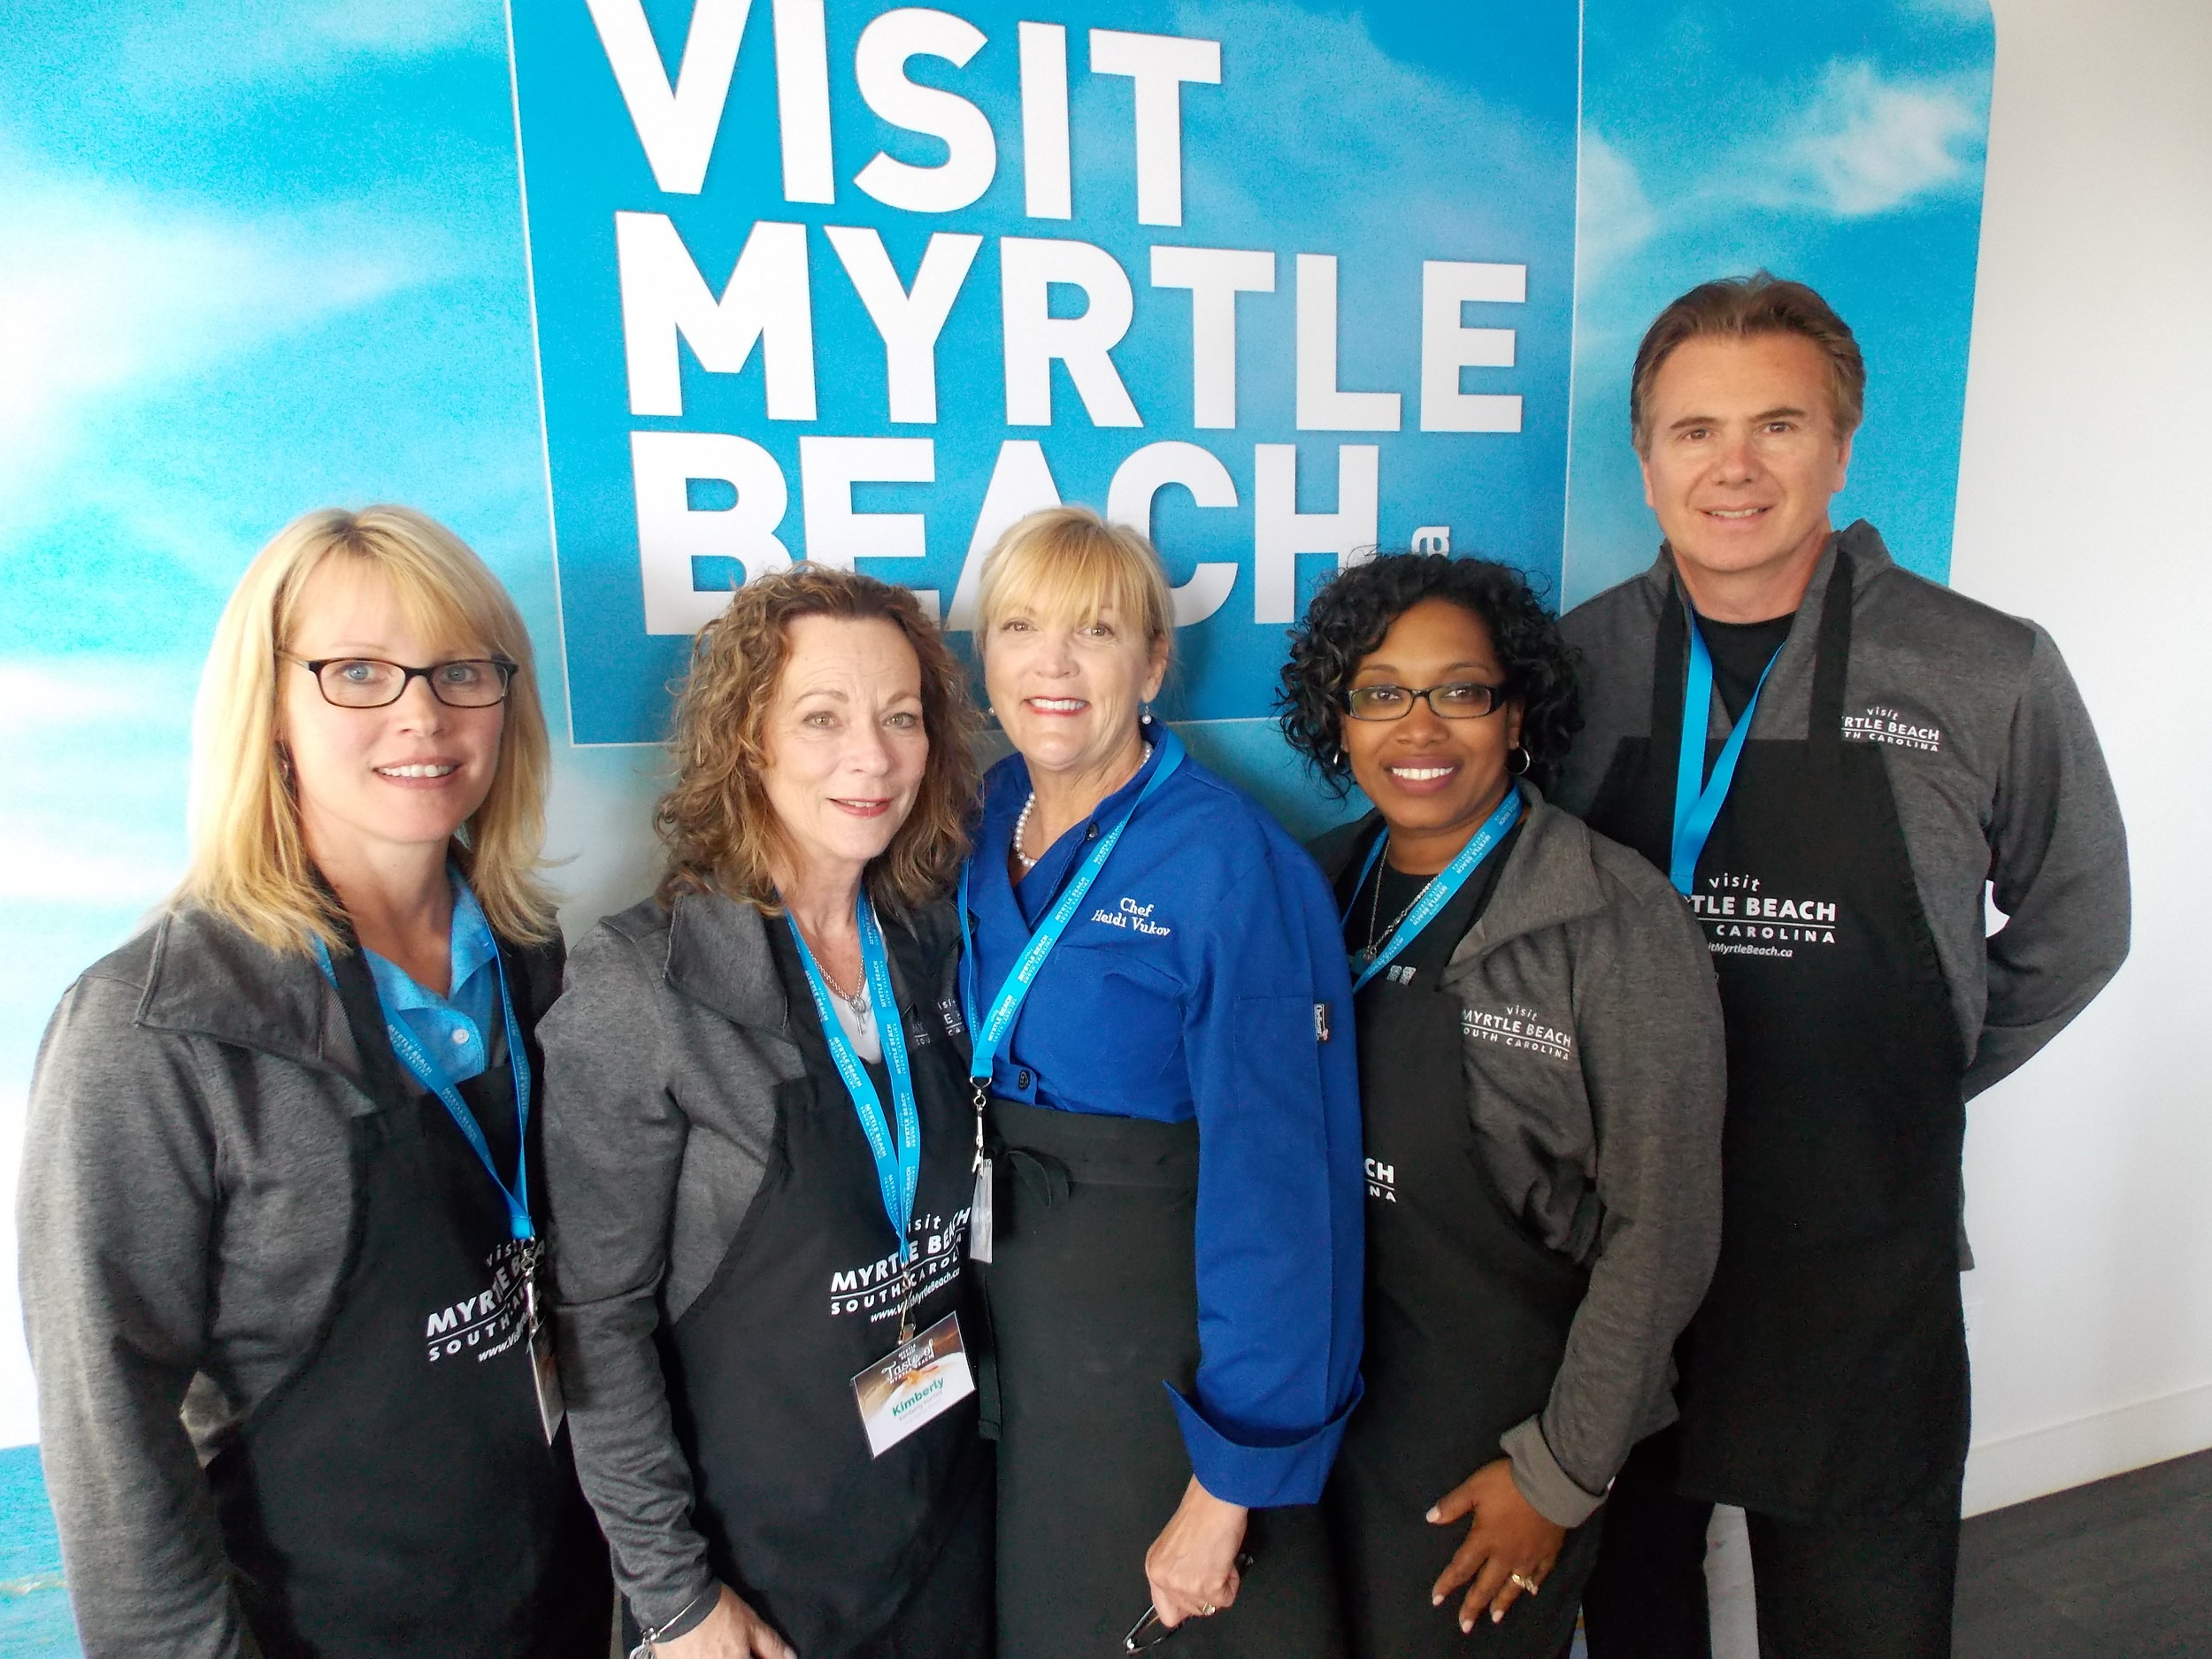 Sales Mission The Myrtle Beach Team.jpg